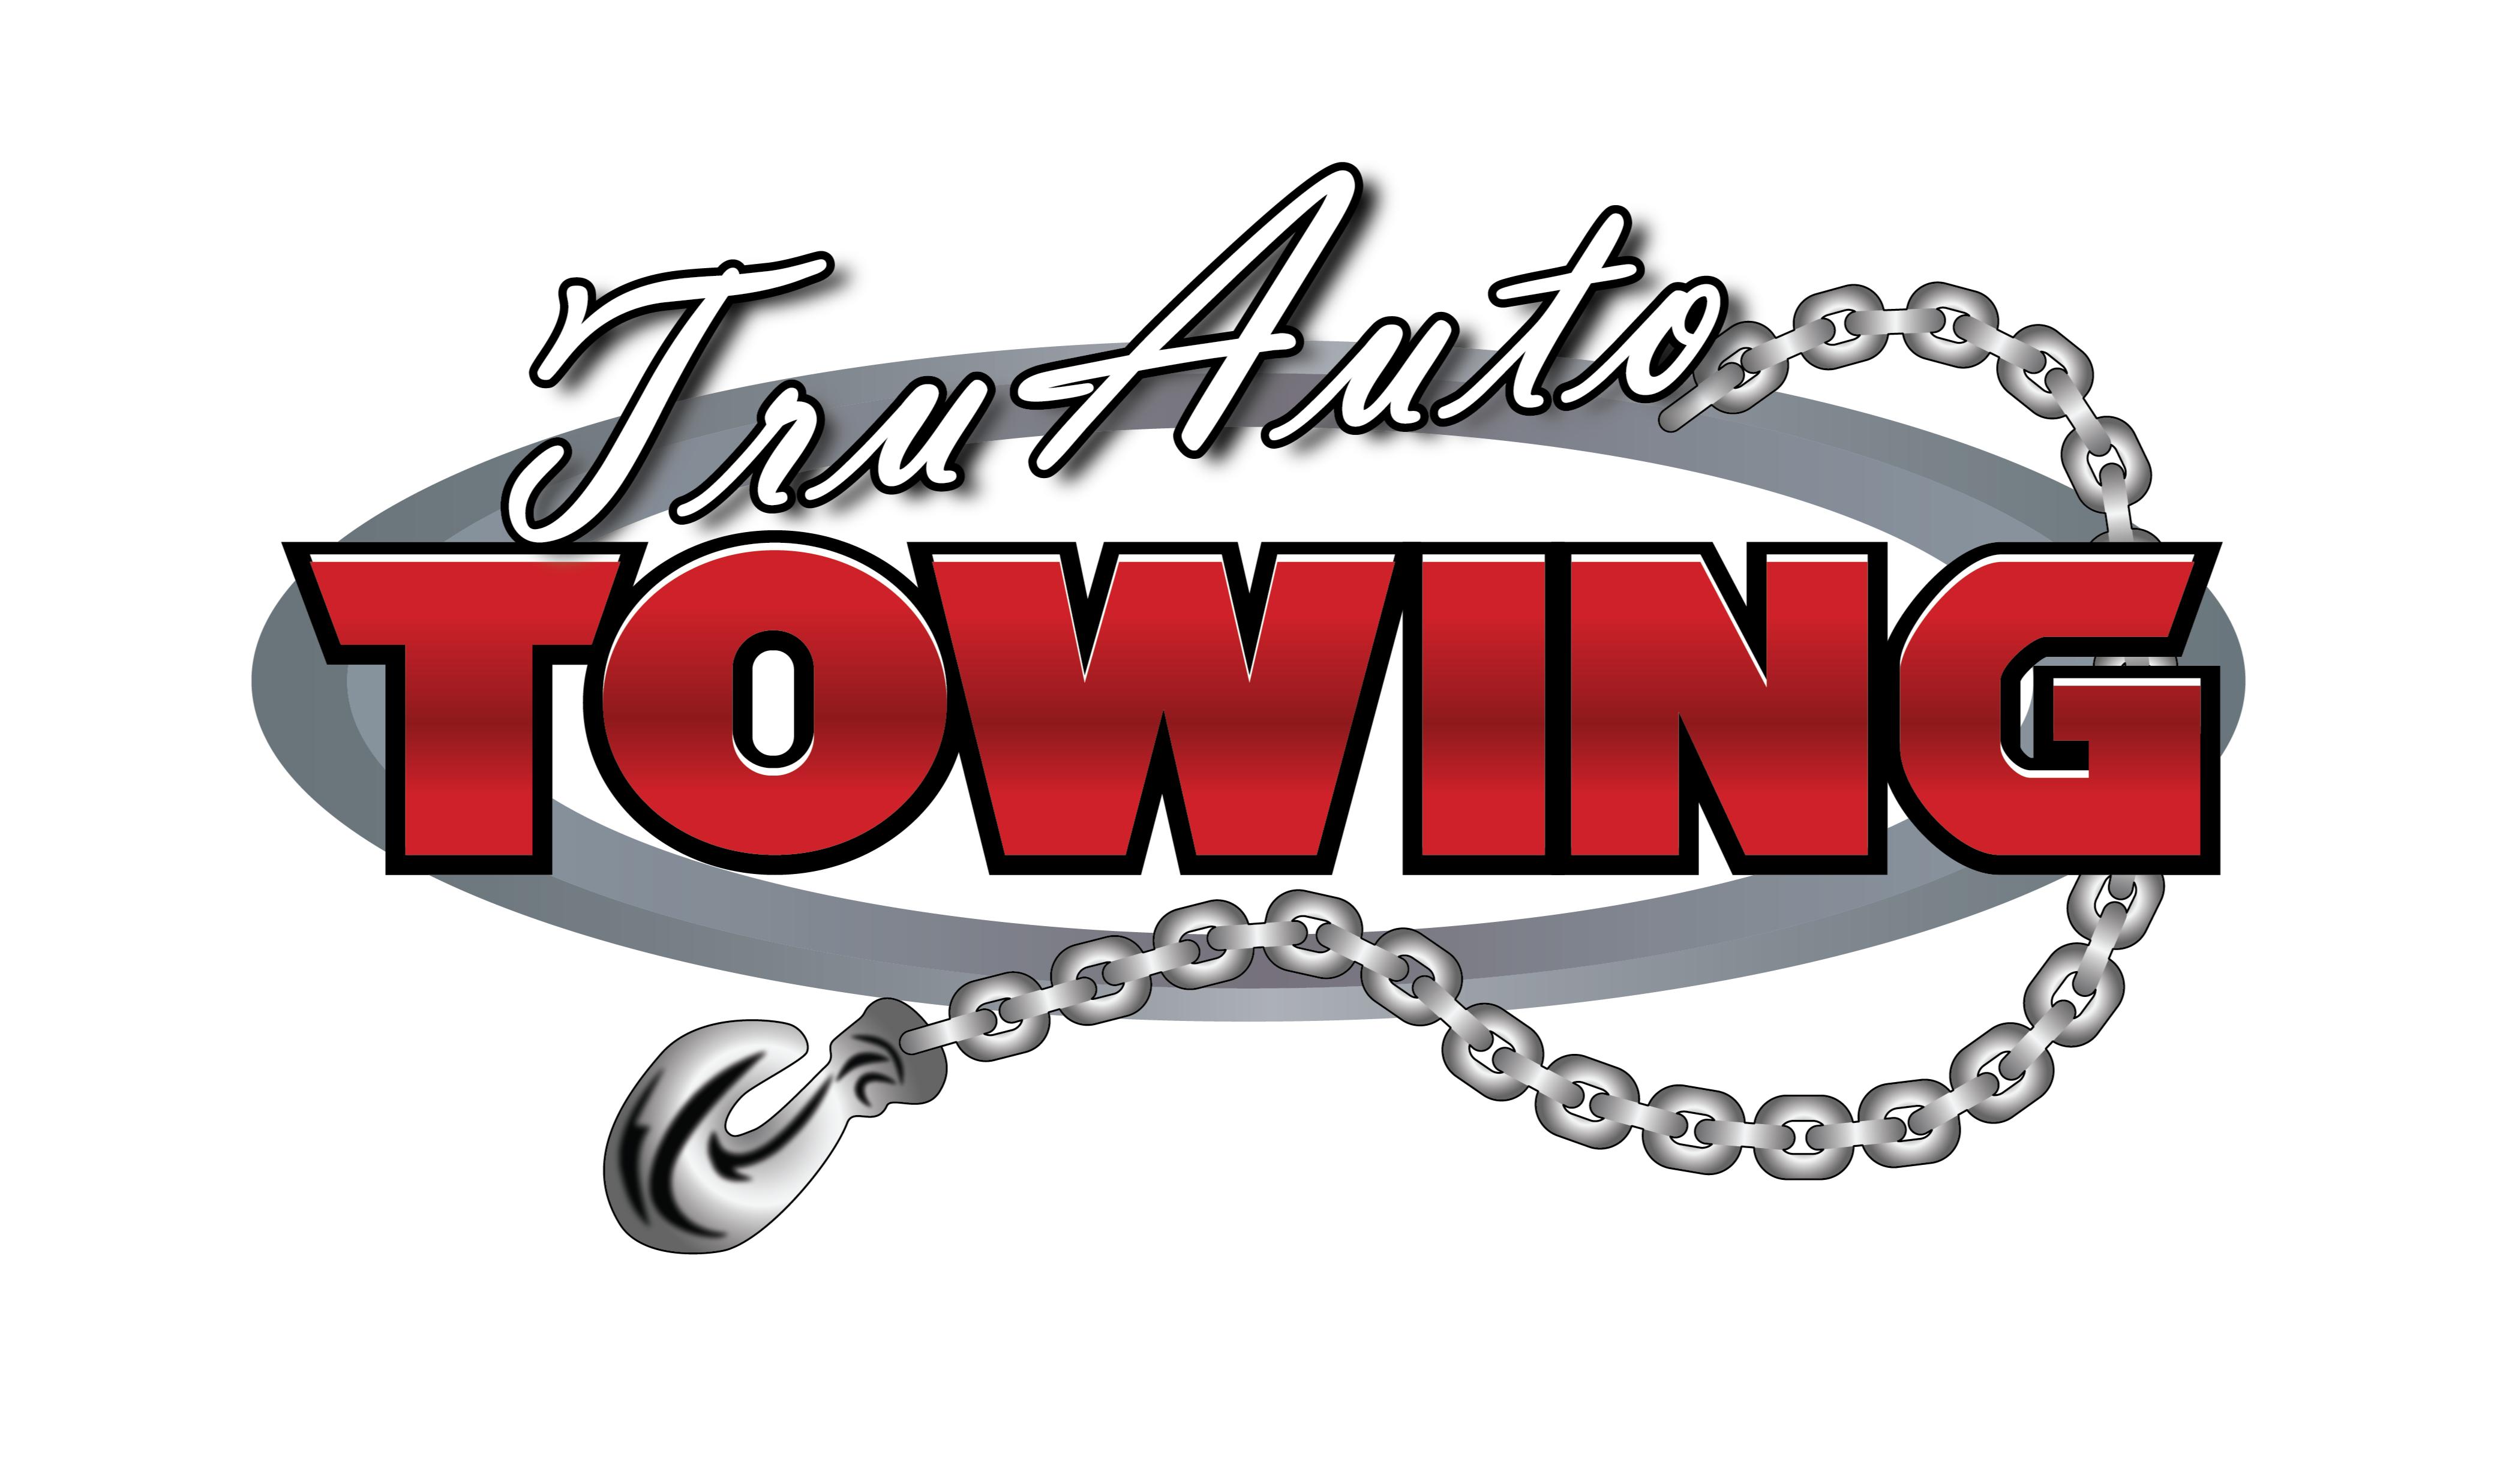 TruAuto Towing logo